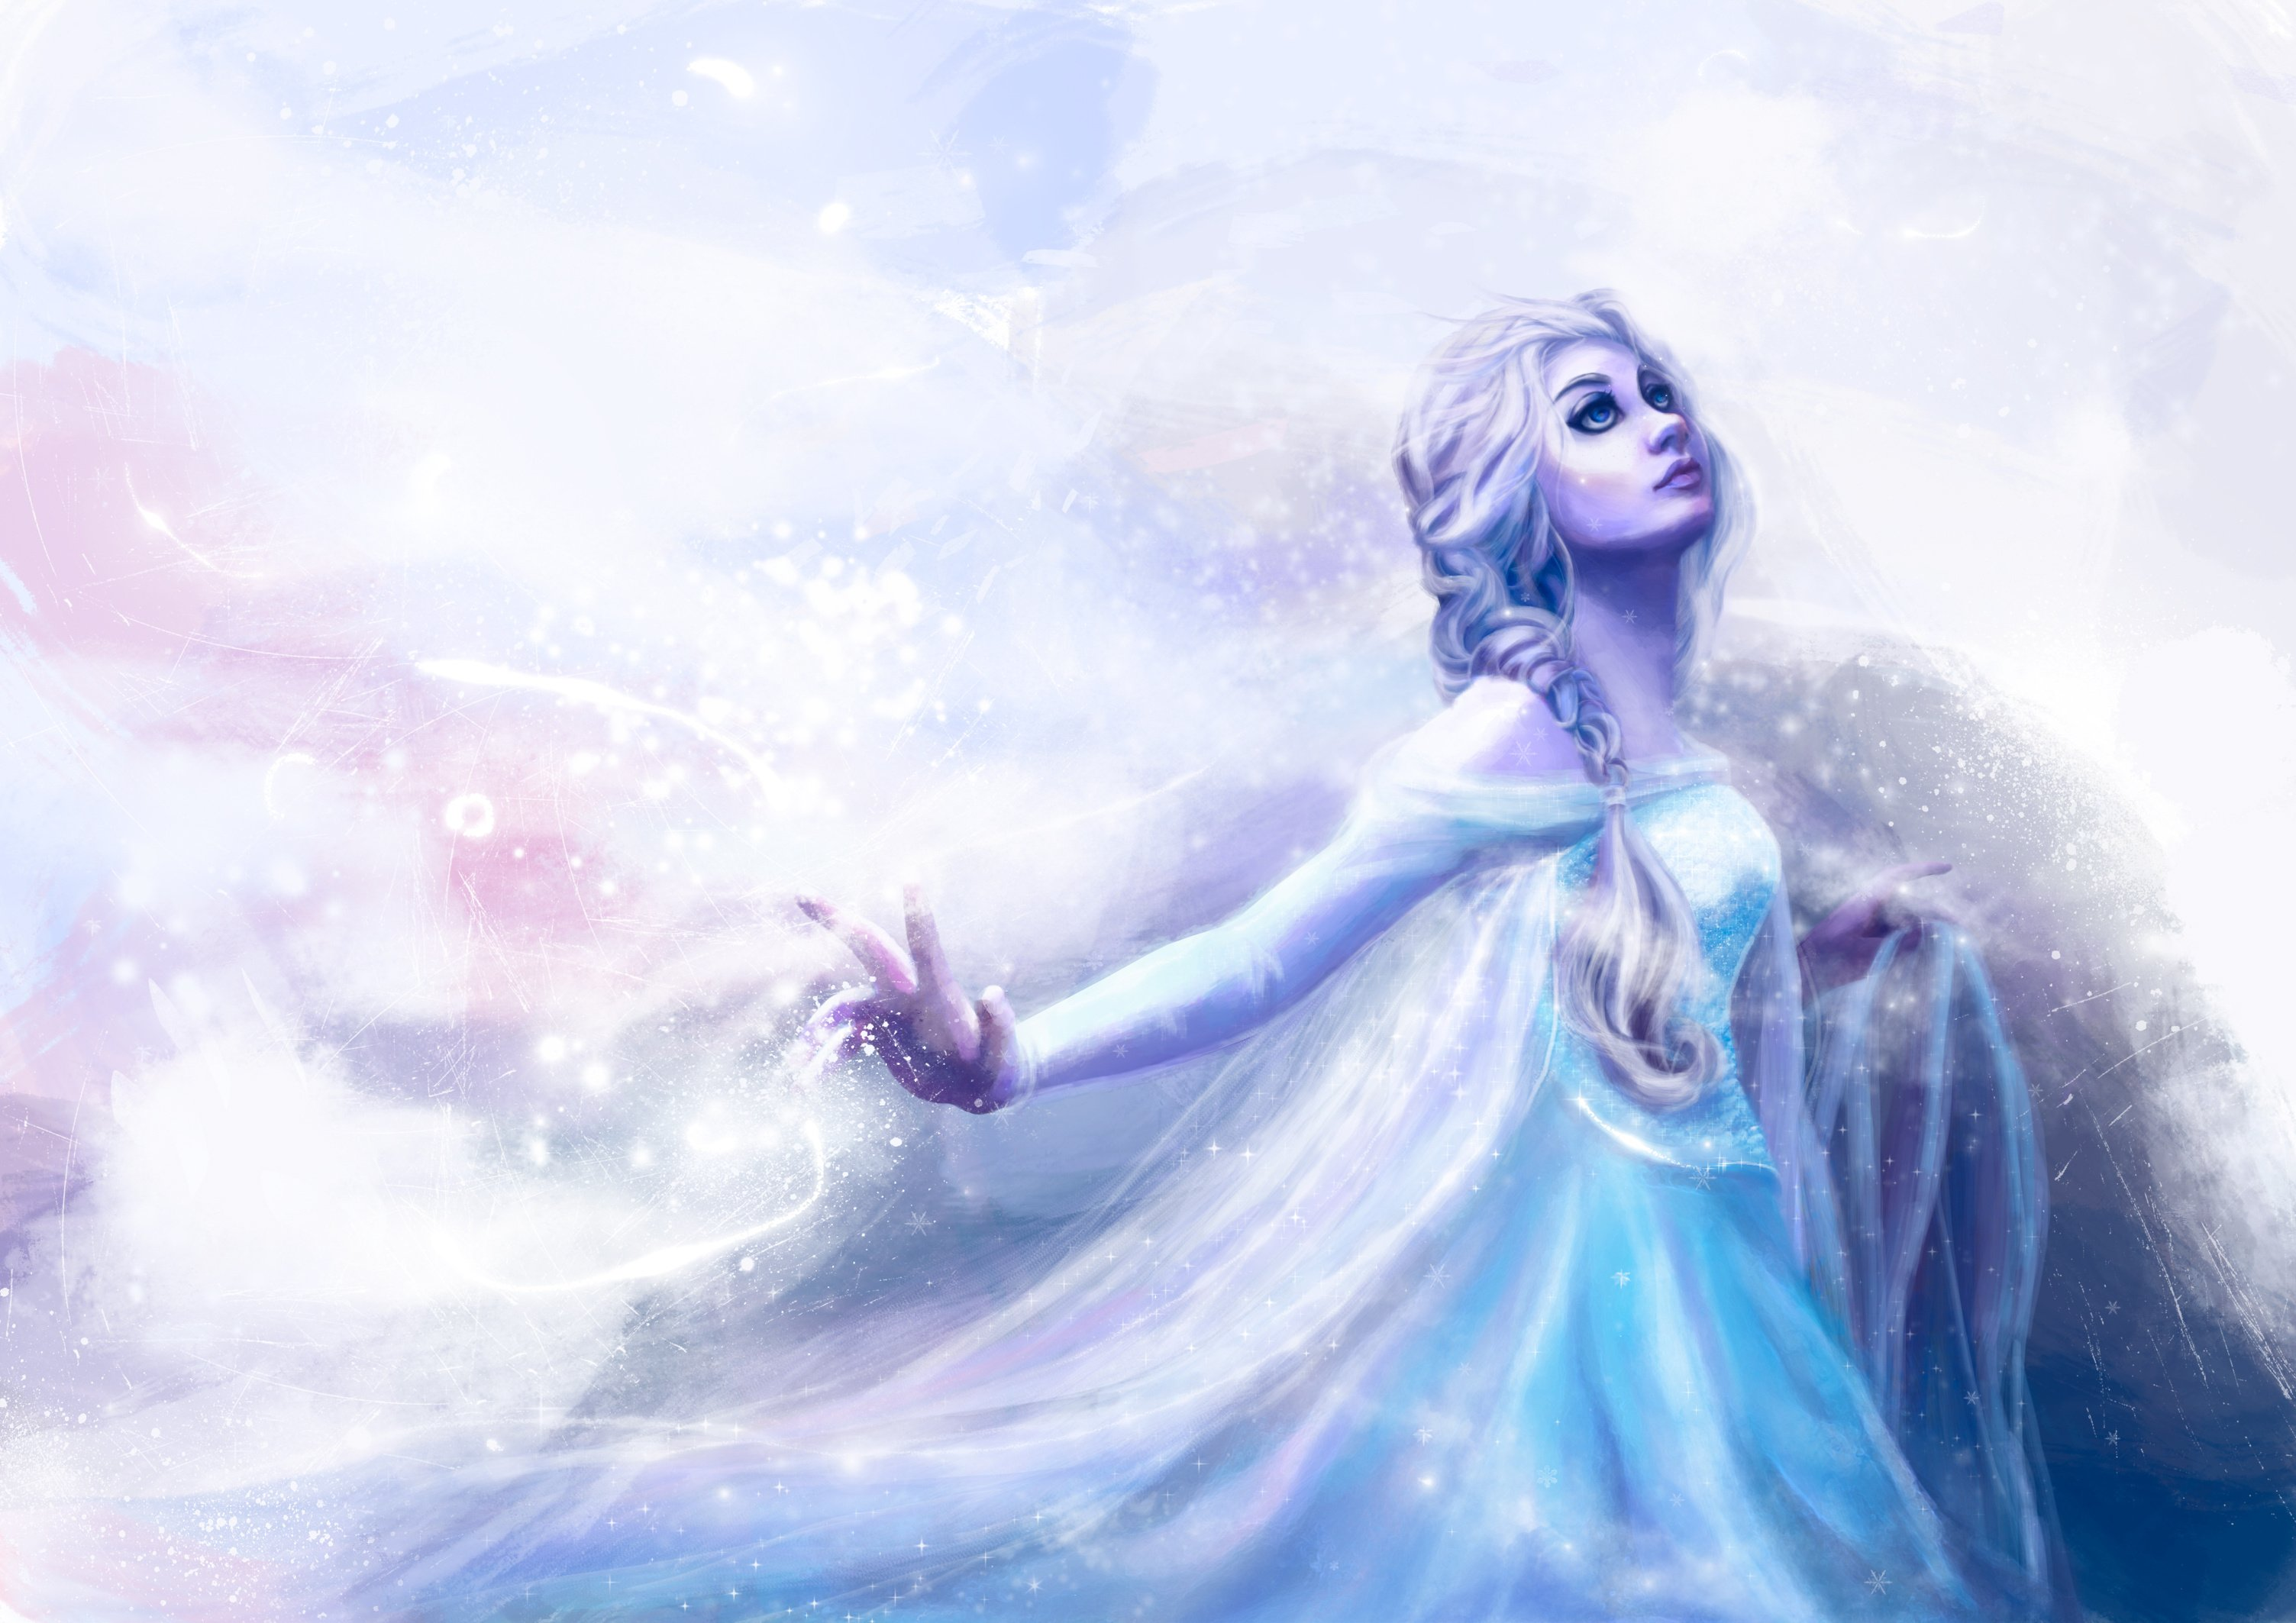 disney frozen snow queen elsa fantasy girl artwork mood wallpaper 3007x2126